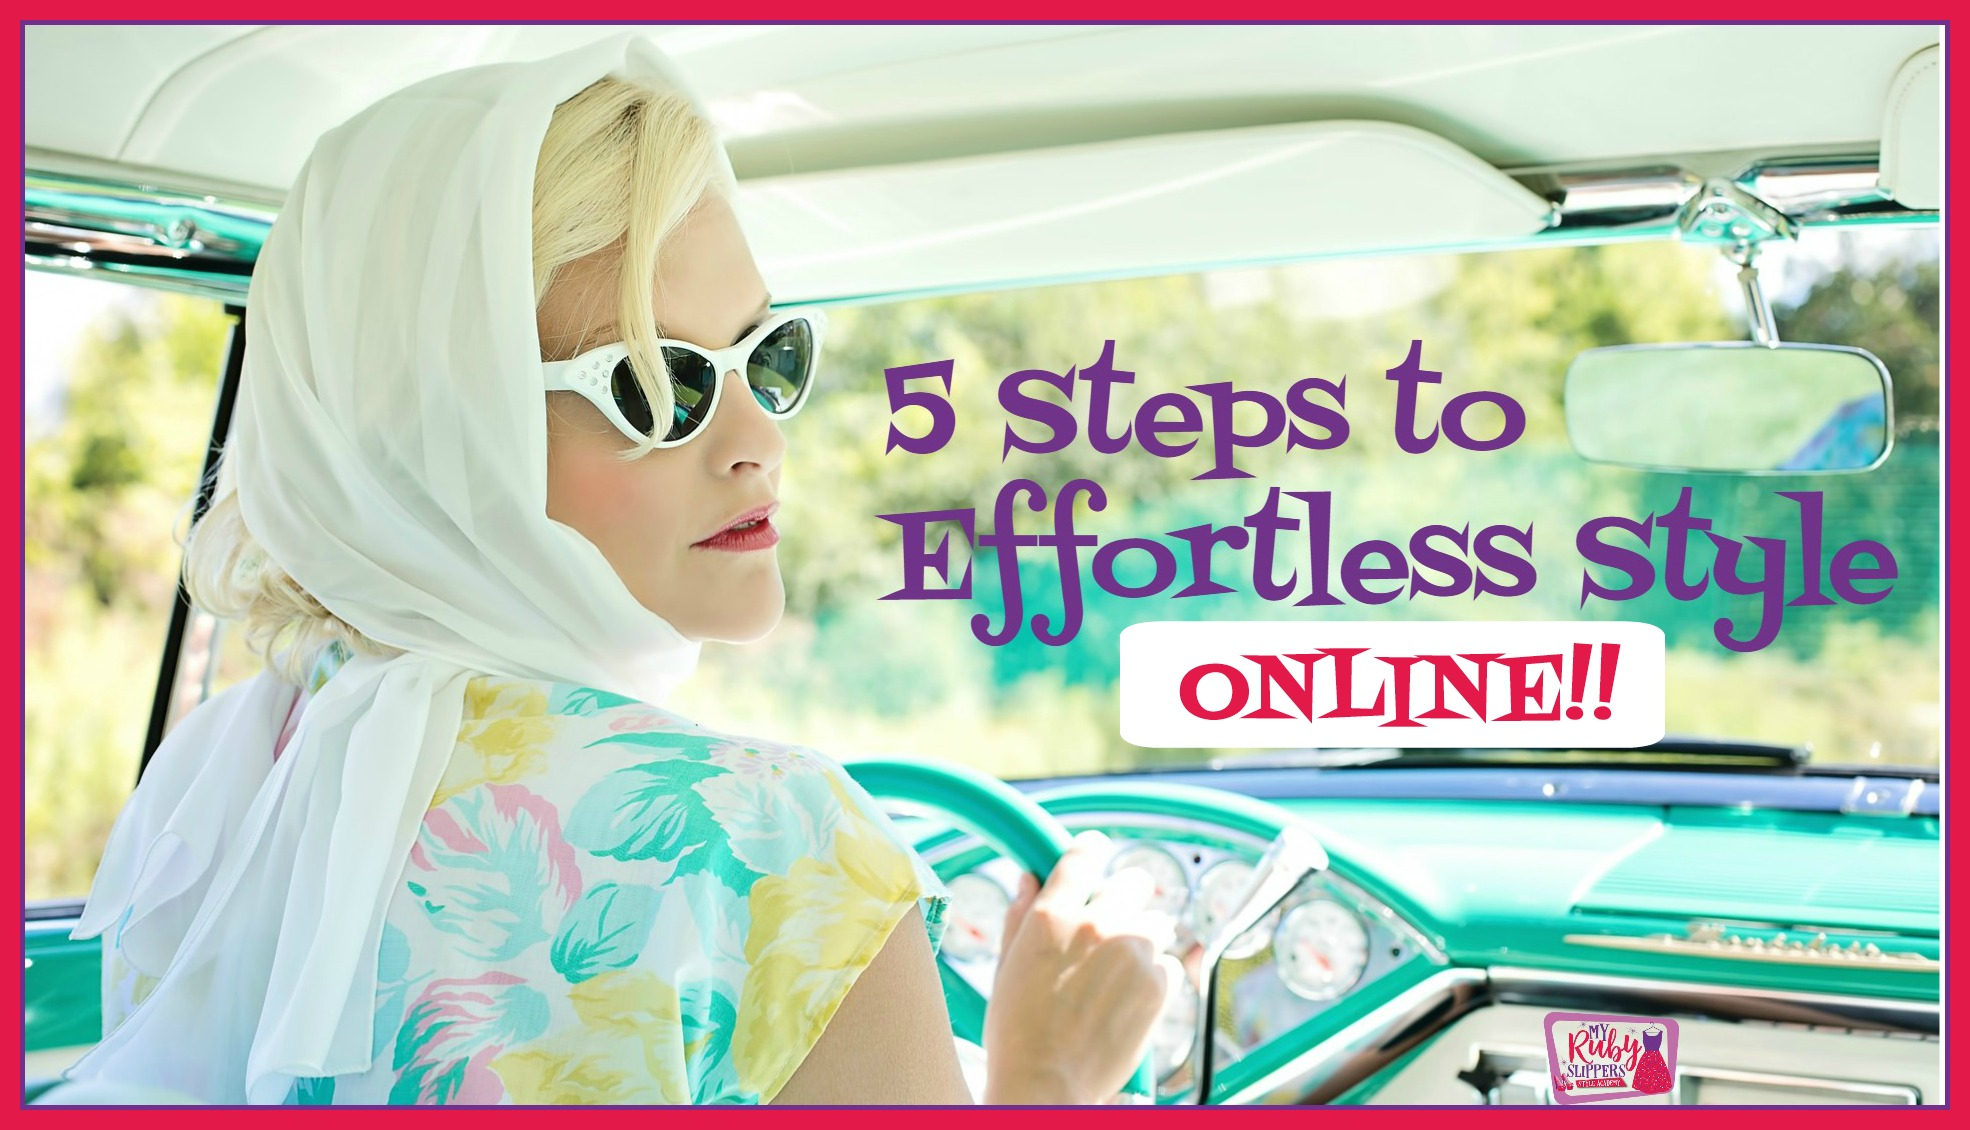 5 STEPS FB ONLINE.jpg